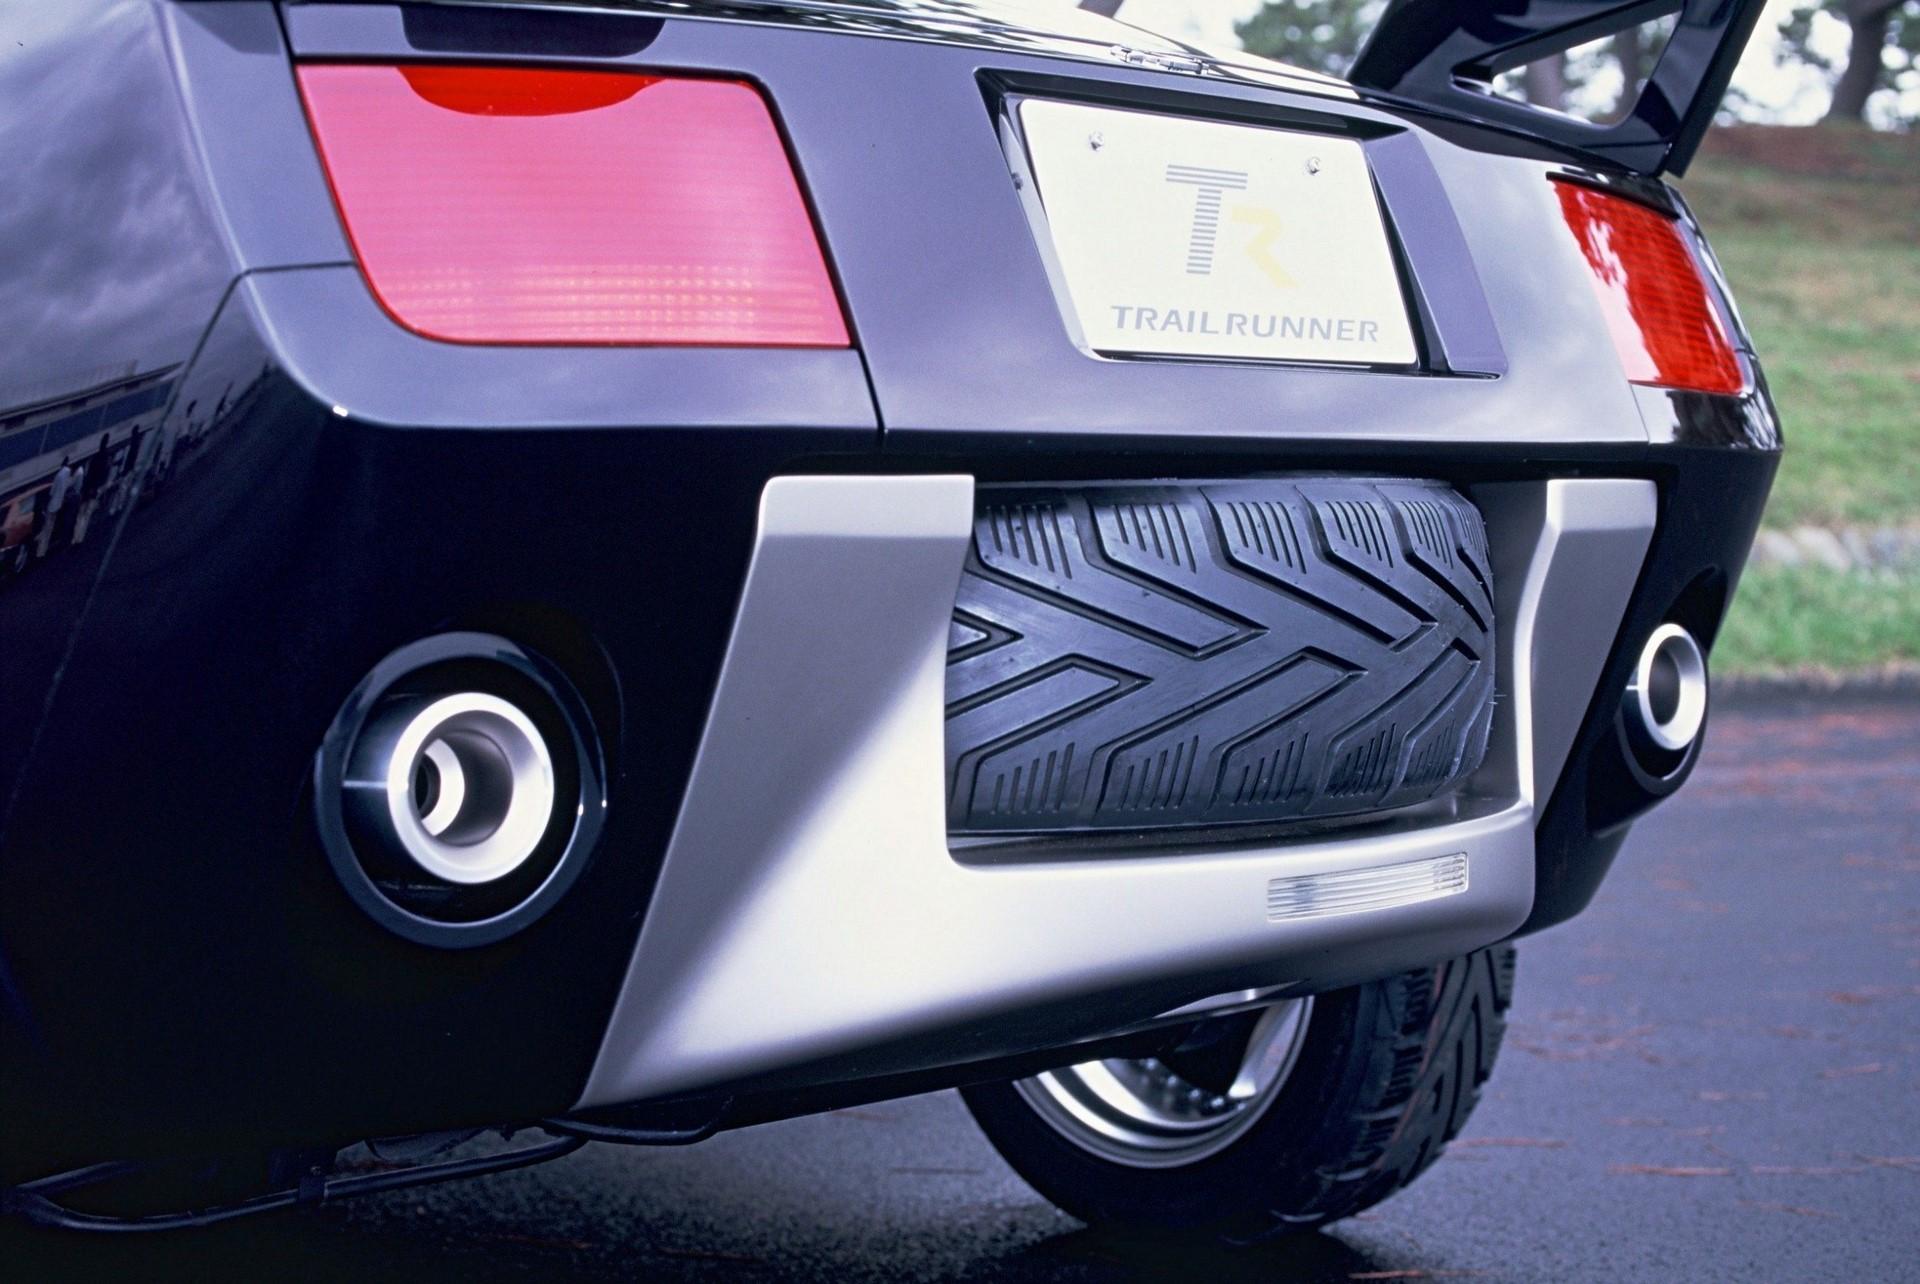 Nissan Trail Runner concept (25)